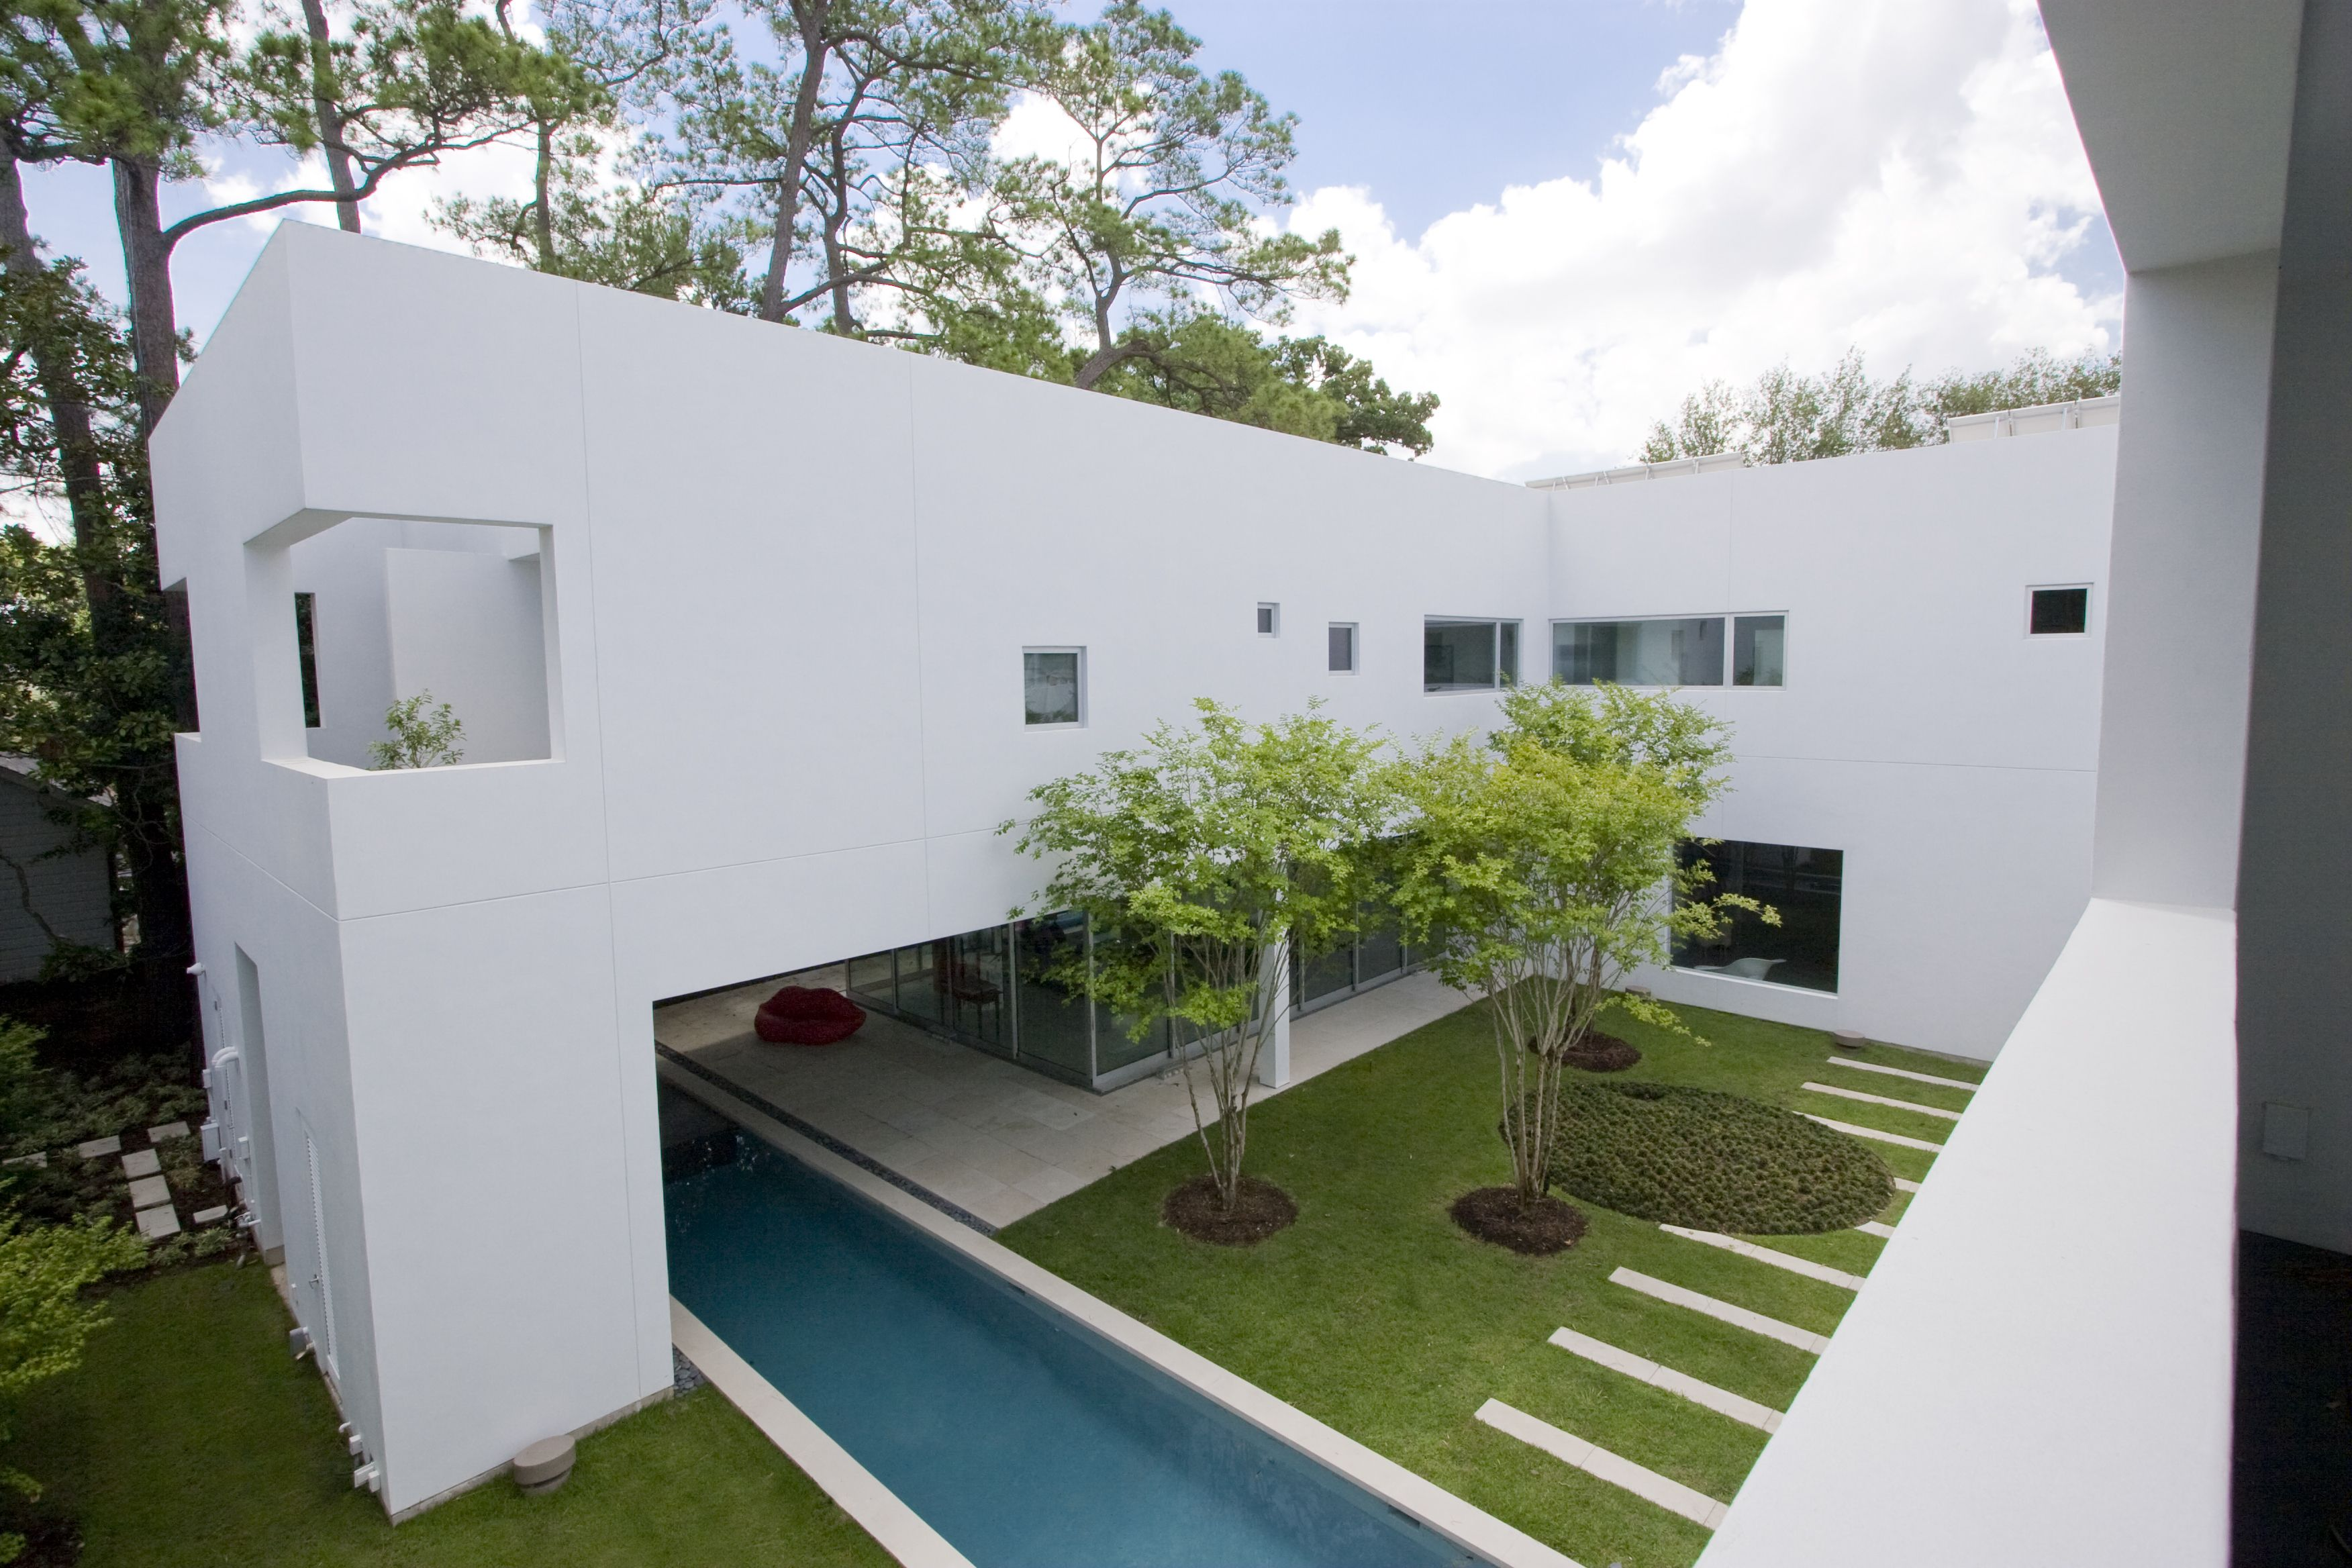 trendy architecture - Google Search | Architecture | Pinterest ...